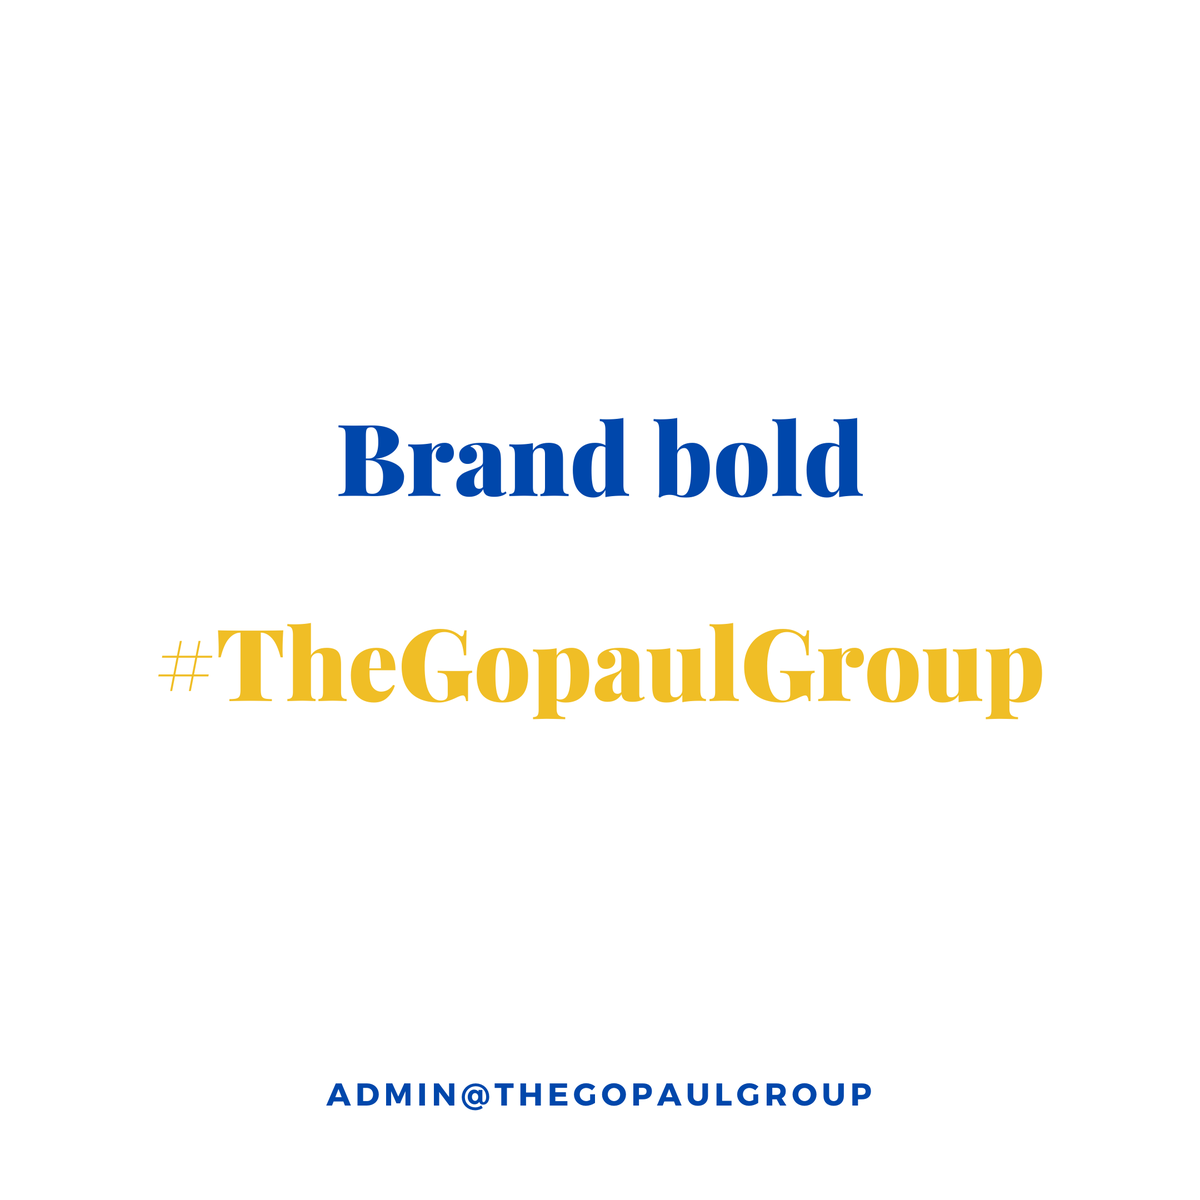 #thegopaulgroup  #entrepreneur #business #goals #inspiration #entrepreneurlife #consultant #businesscoach #blackbusiness #mindset  #blackowned #marketing #digitalmarketing #socialmedia https://t.co/UD6duulsSJ